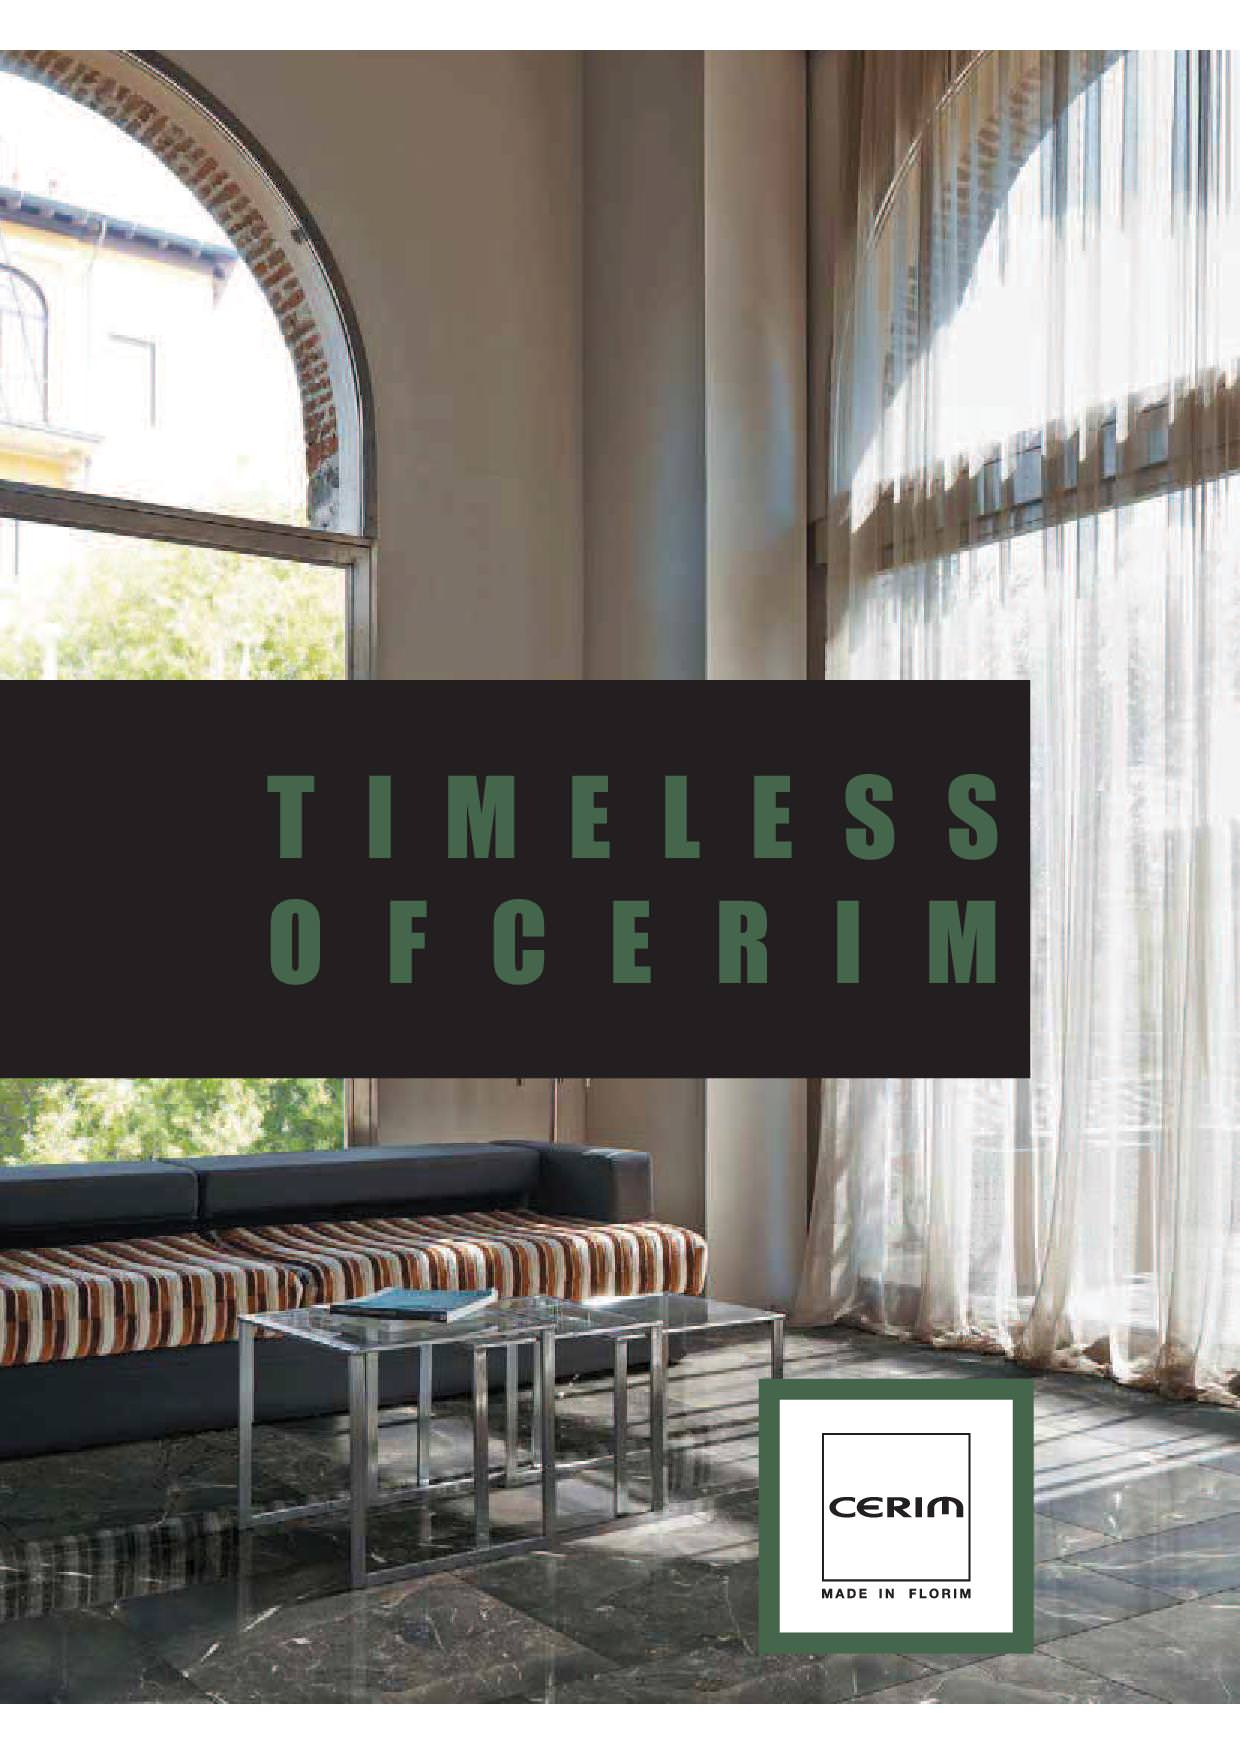 CERIM TIMELESS